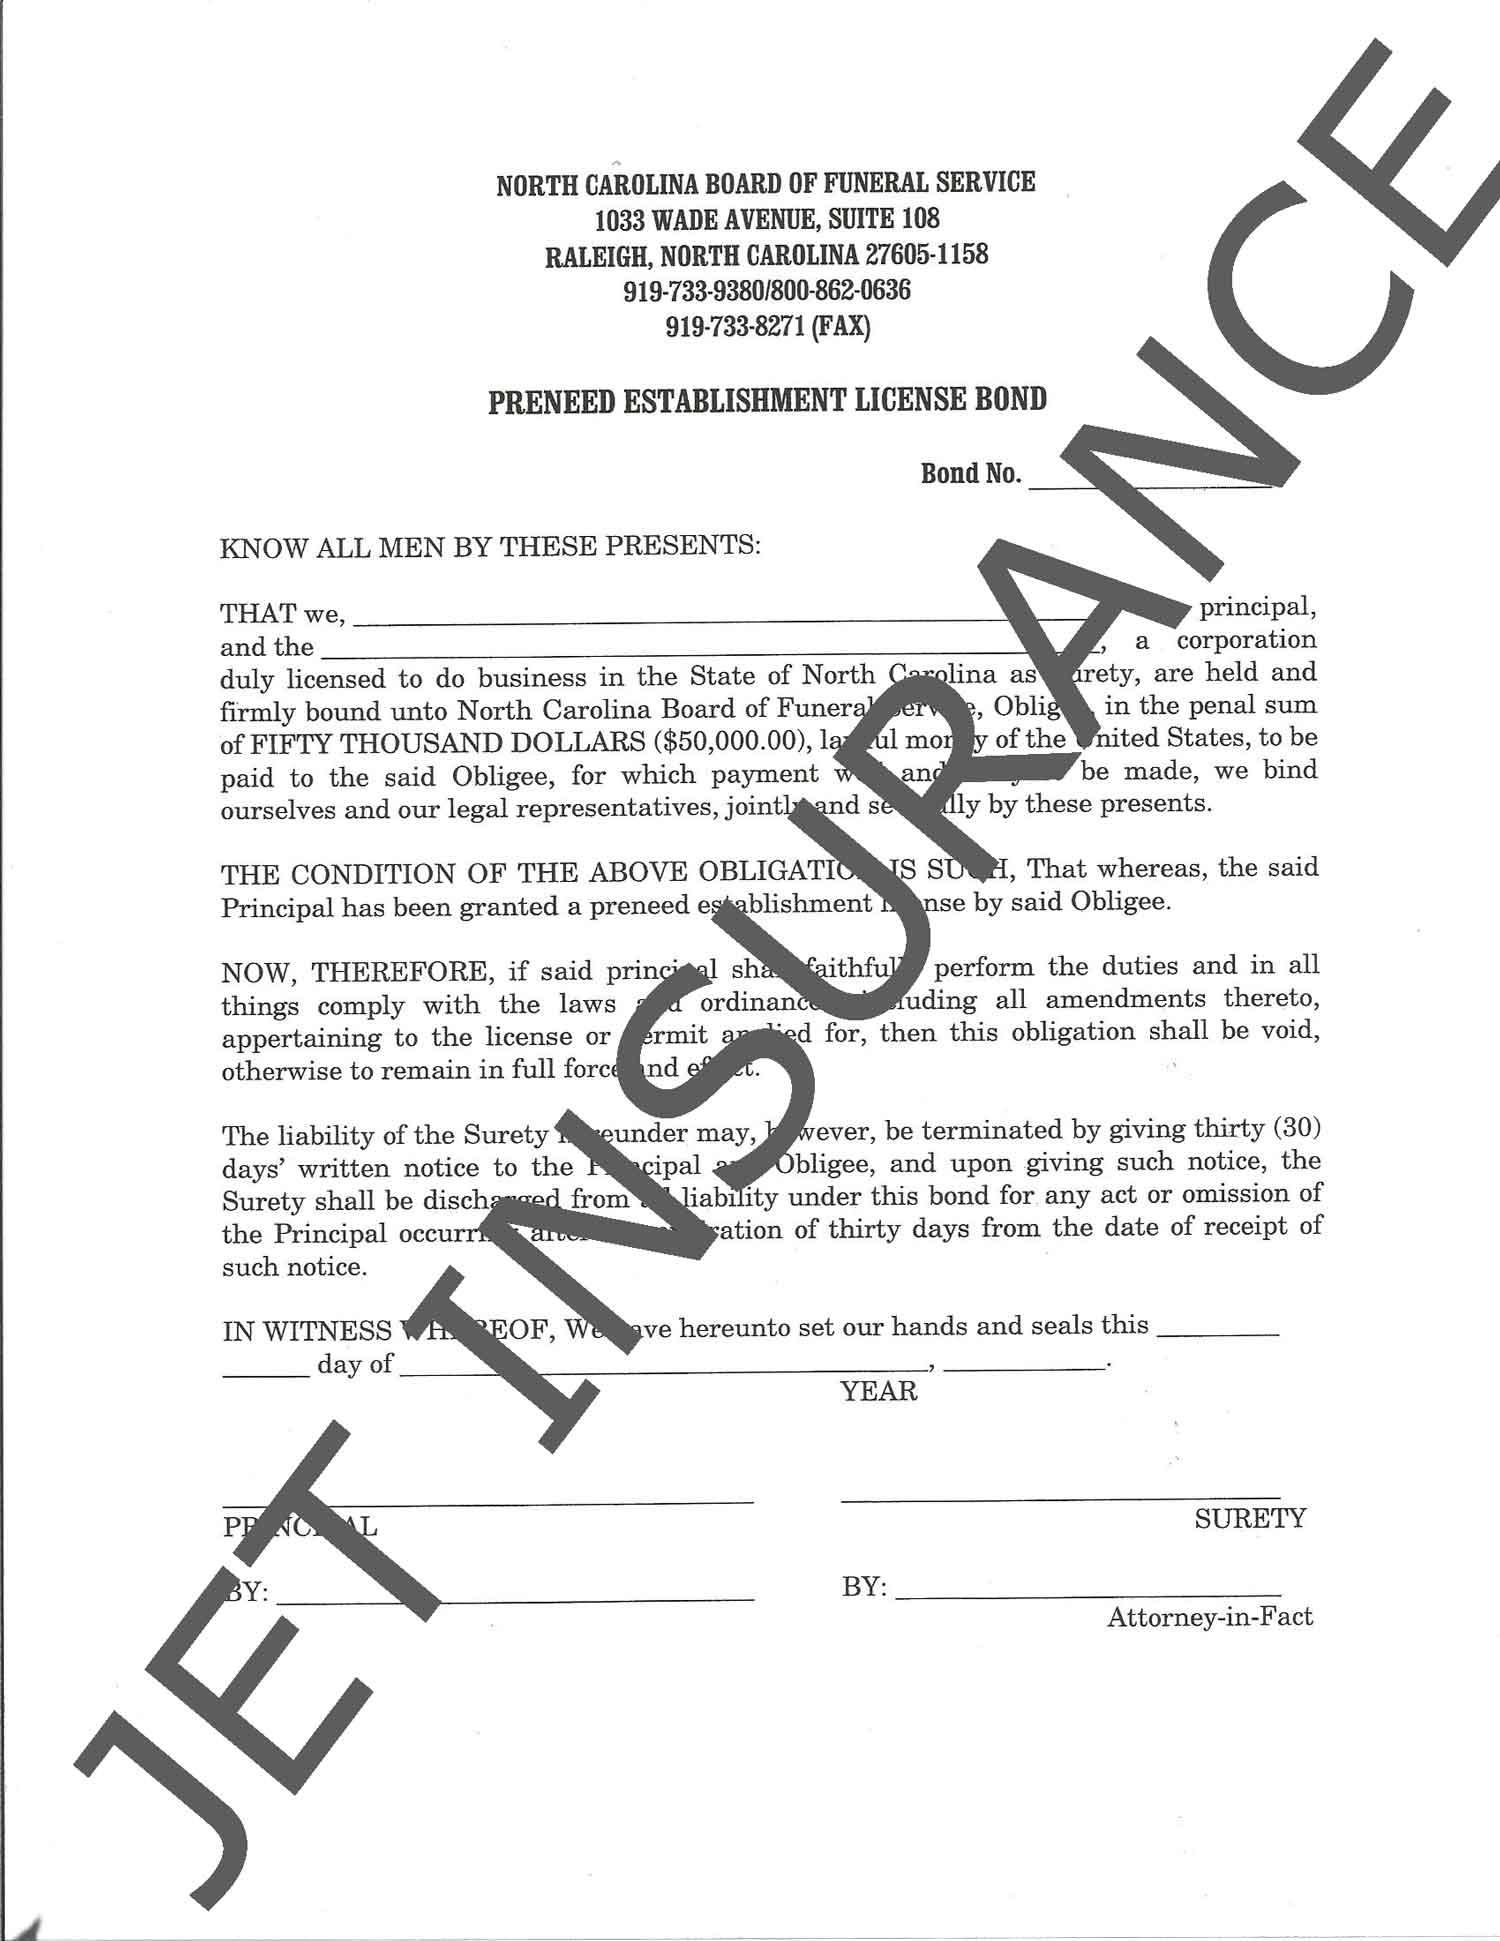 North Carolina Preneed Funeral Bond Form